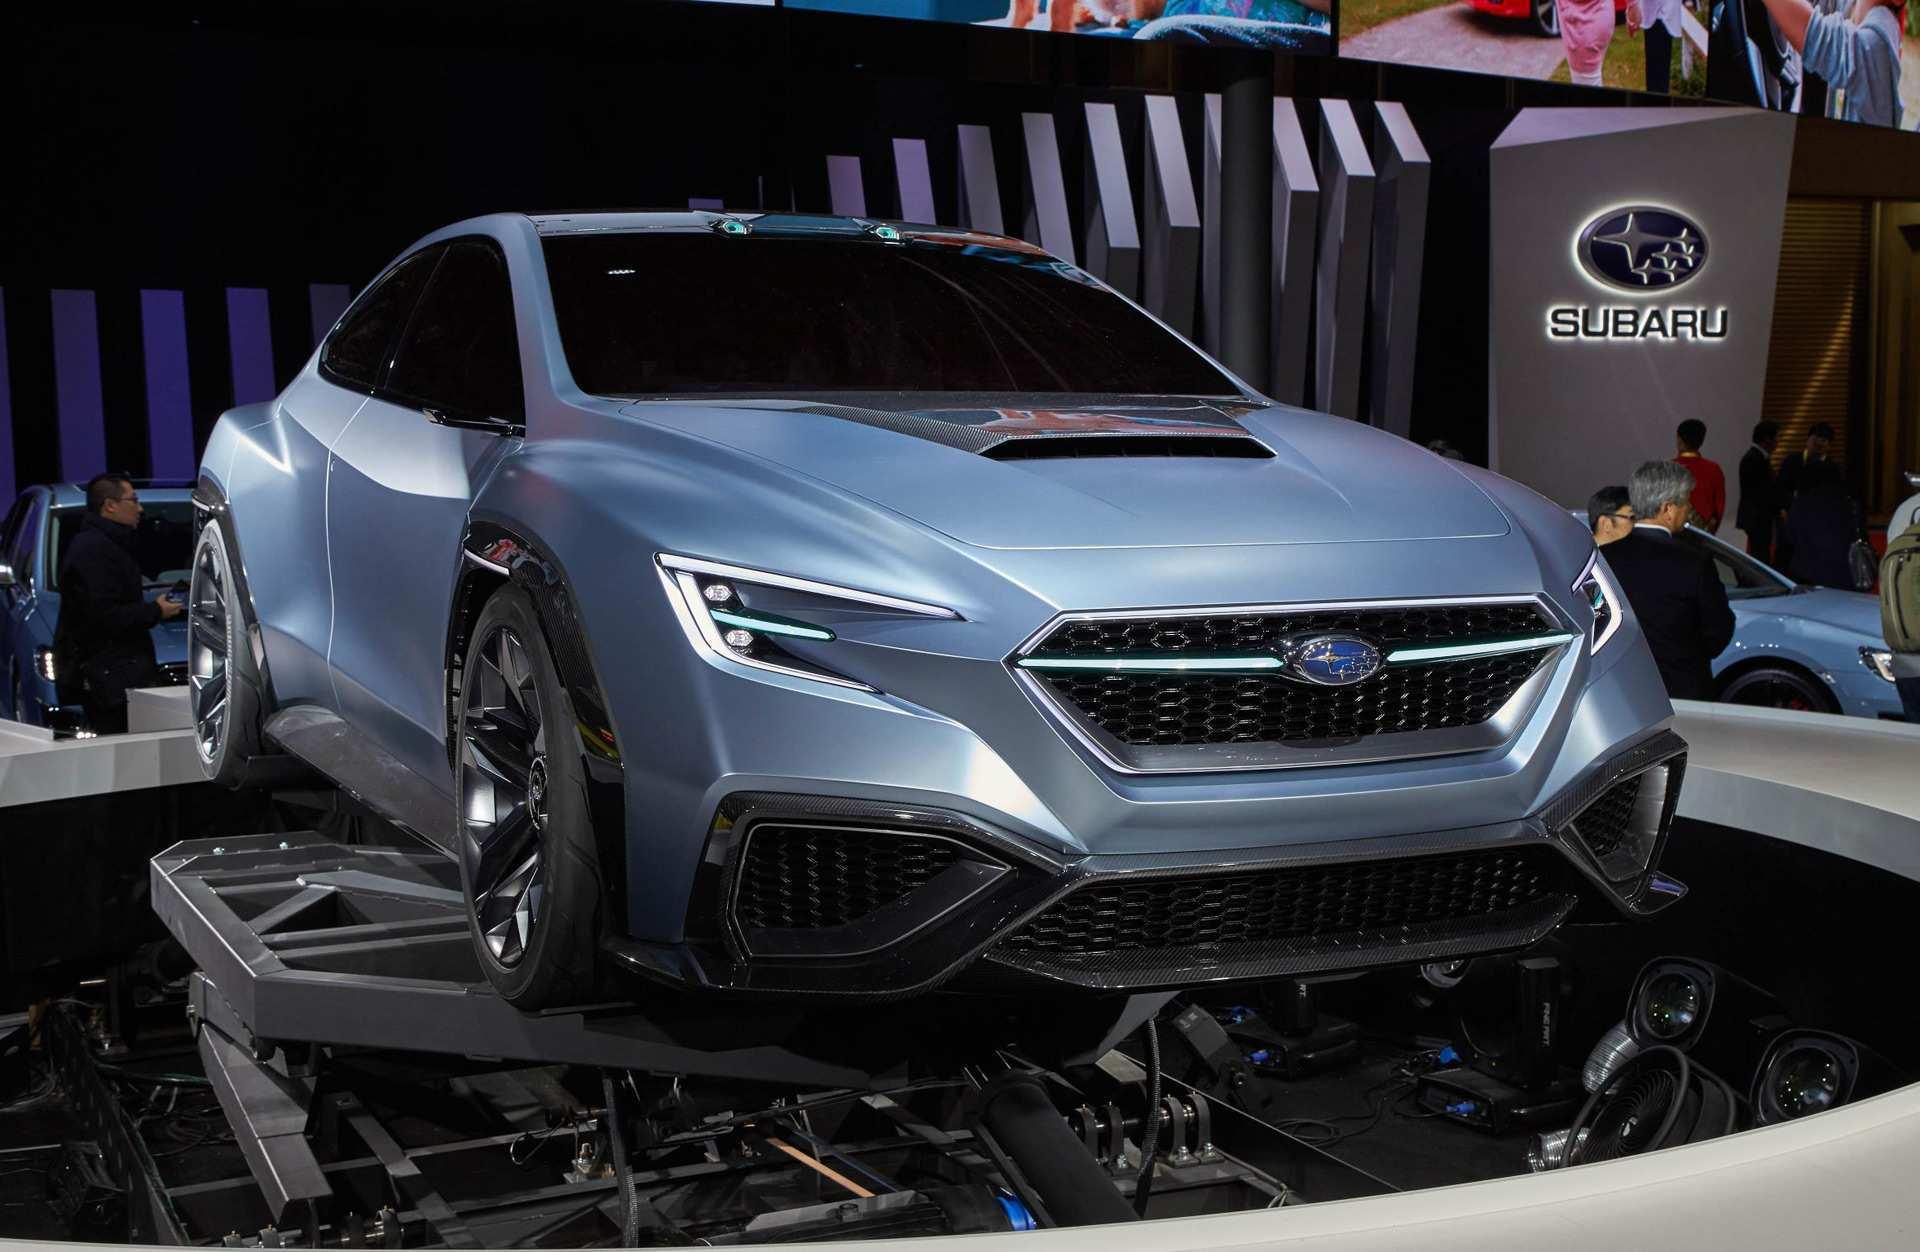 18 Great Subaru Sti 2020 Concept Spesification by Subaru Sti 2020 Concept